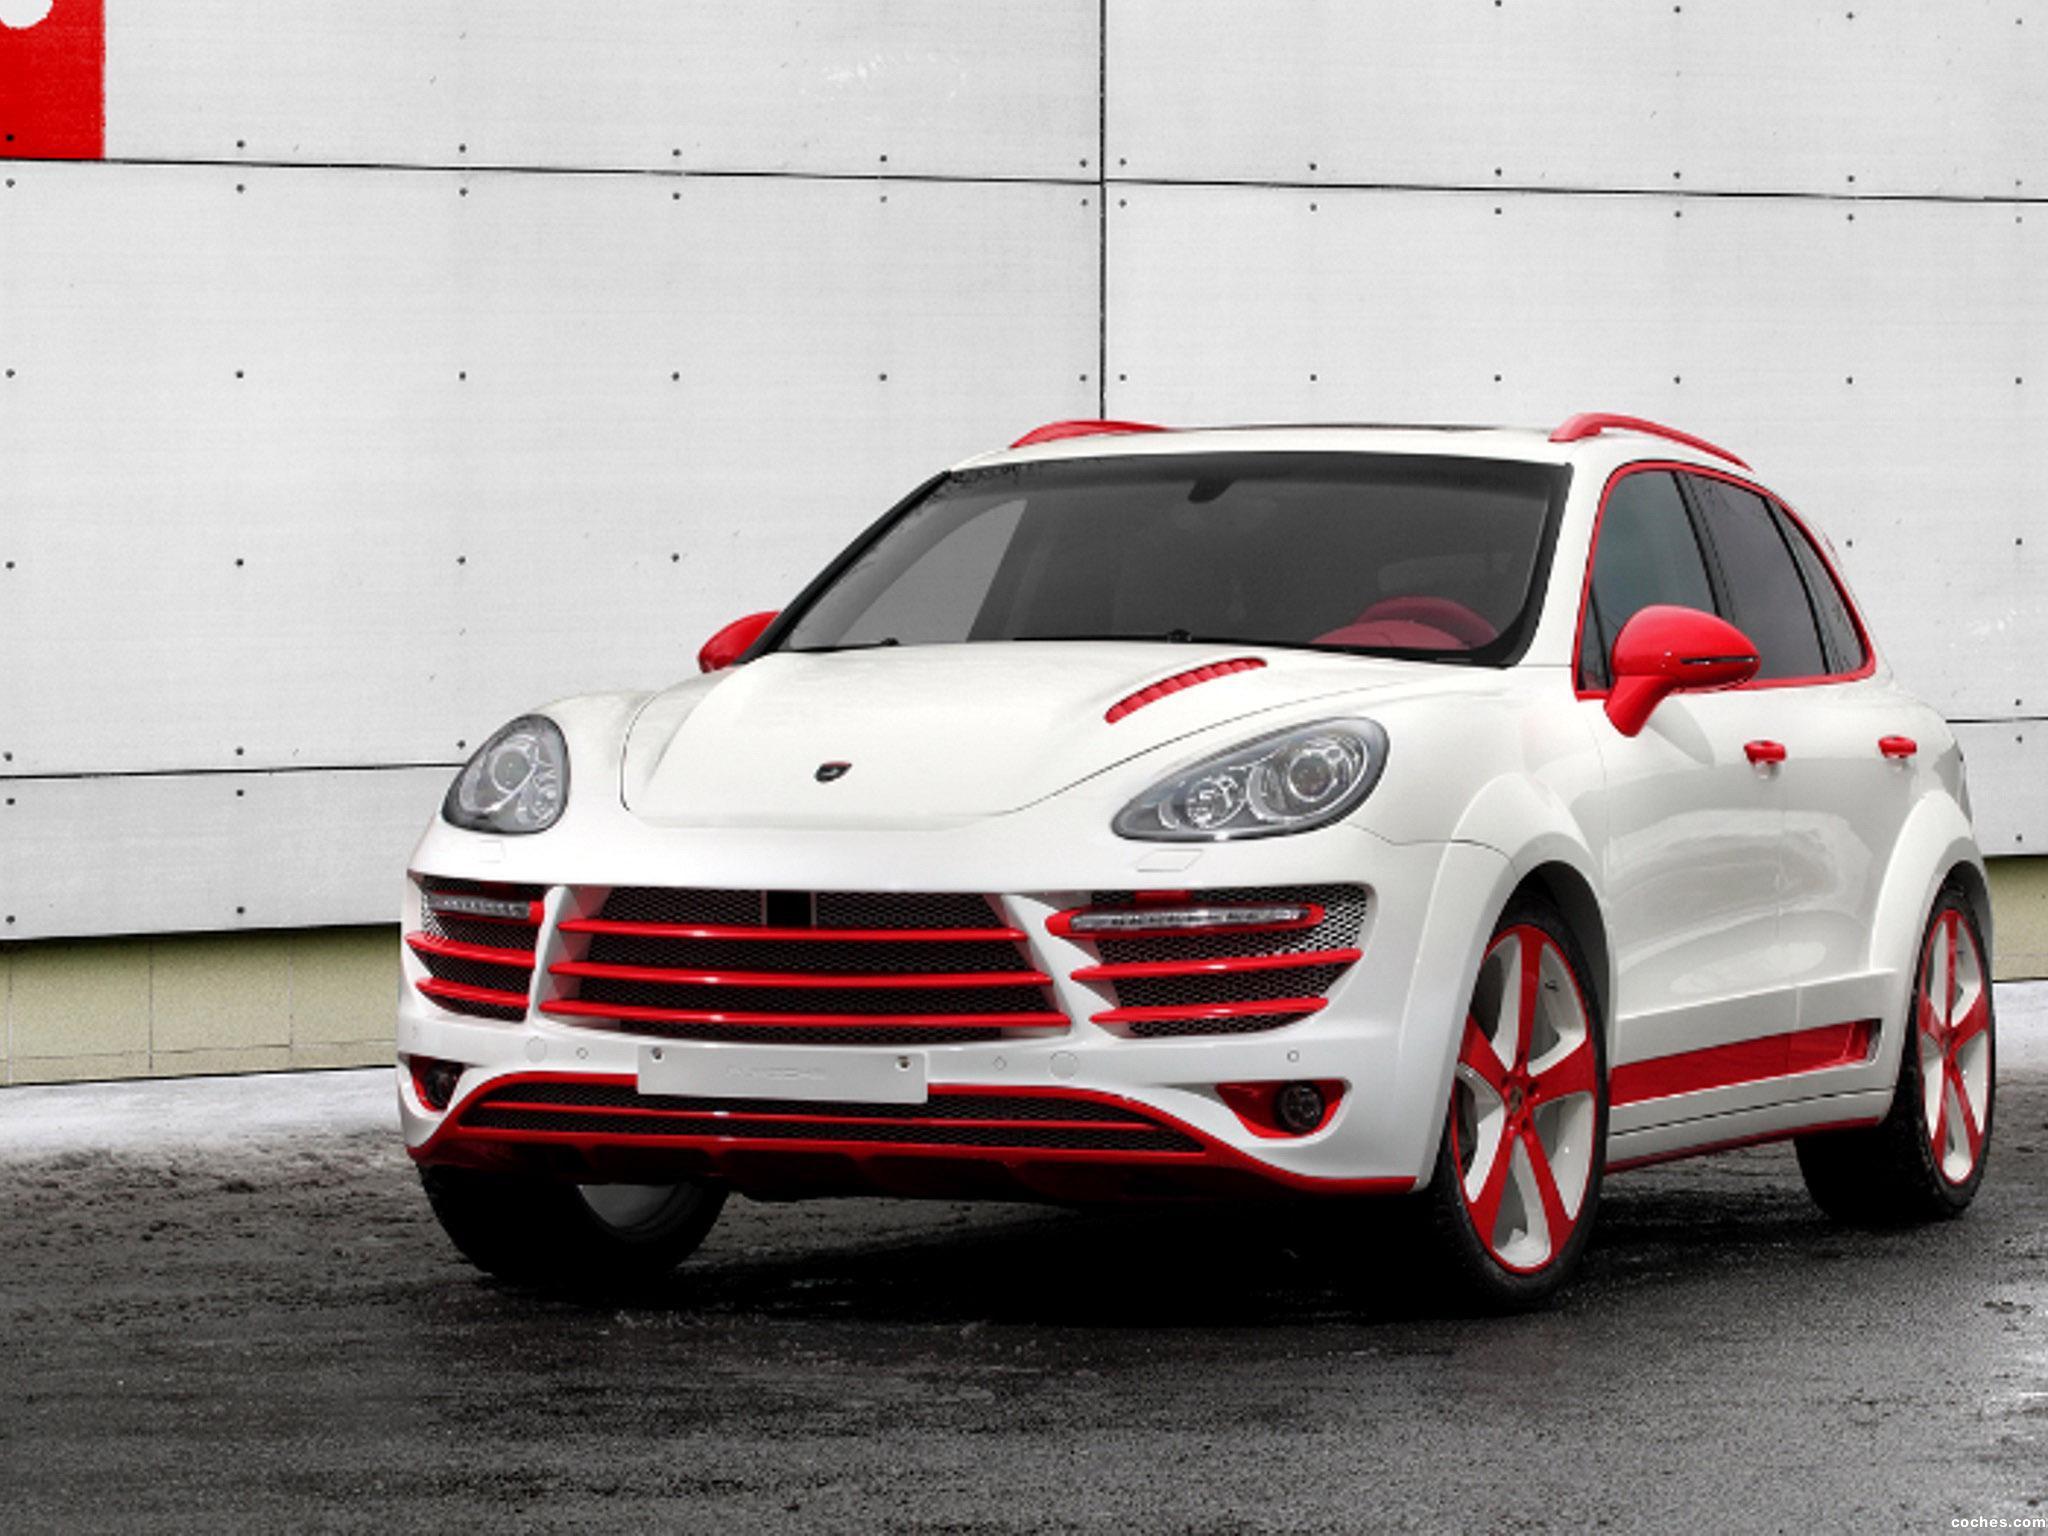 Foto 0 de Topcar Porsche Cayenne Vantage 2 Red Dracon 958 2013